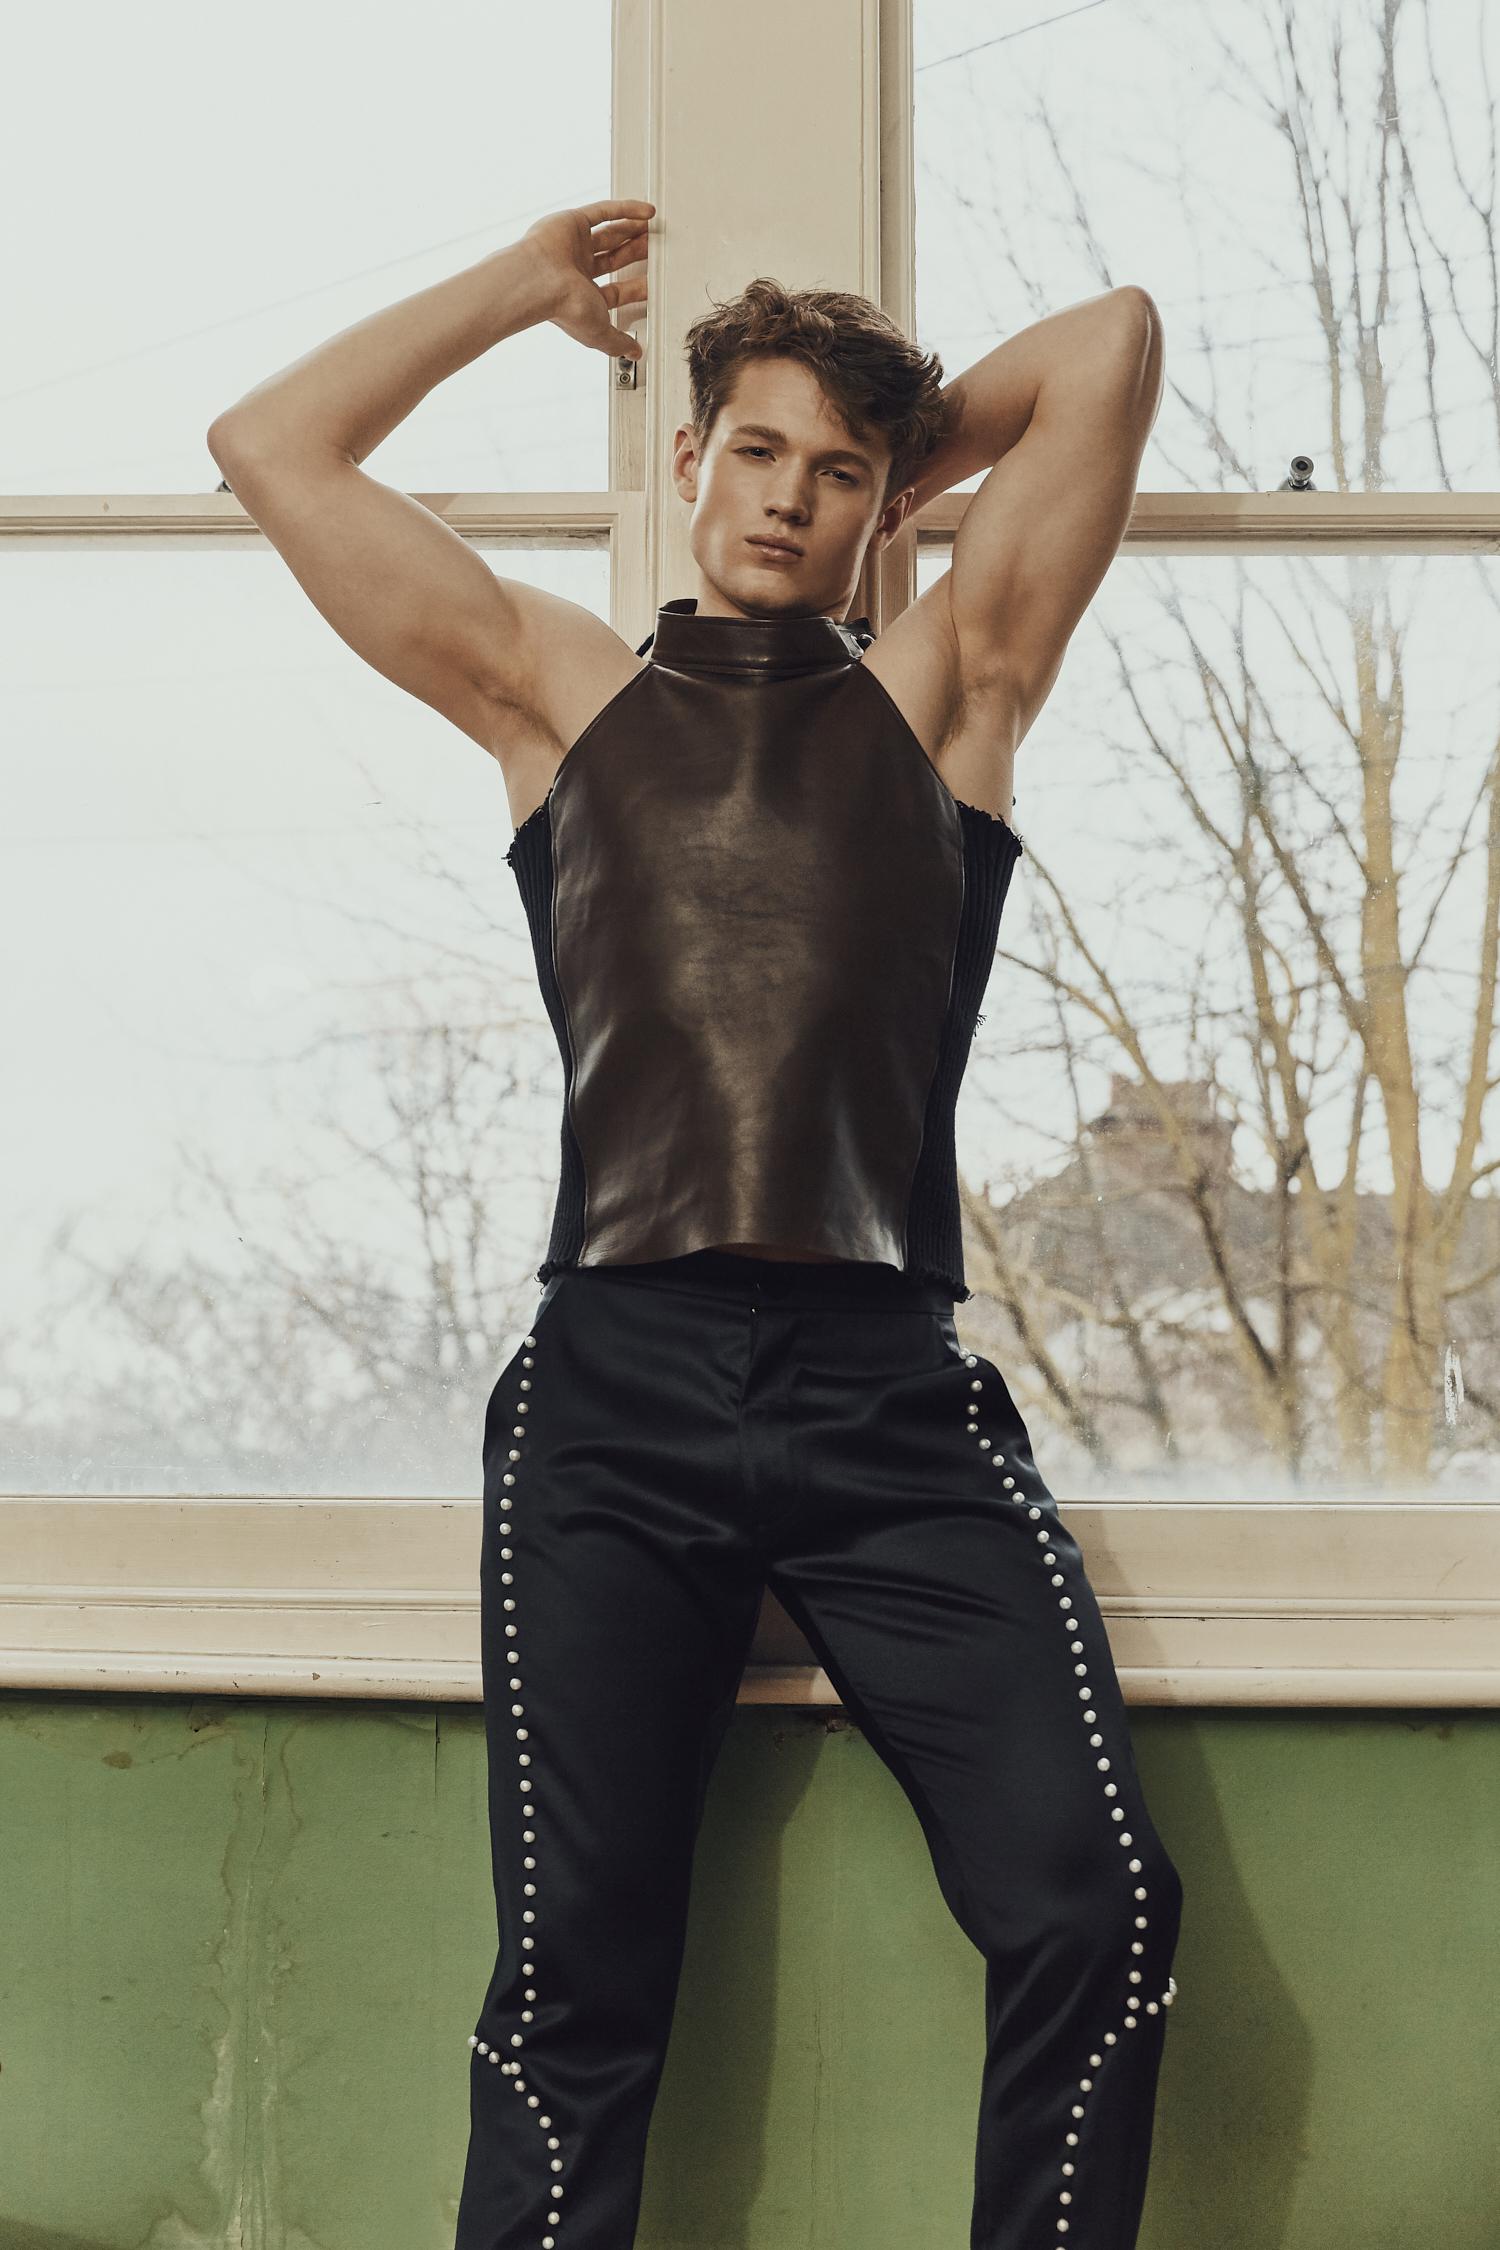 Leather Vest -  Daniel W. Fletcher , Trousers -  Aleksandra Seweryniak